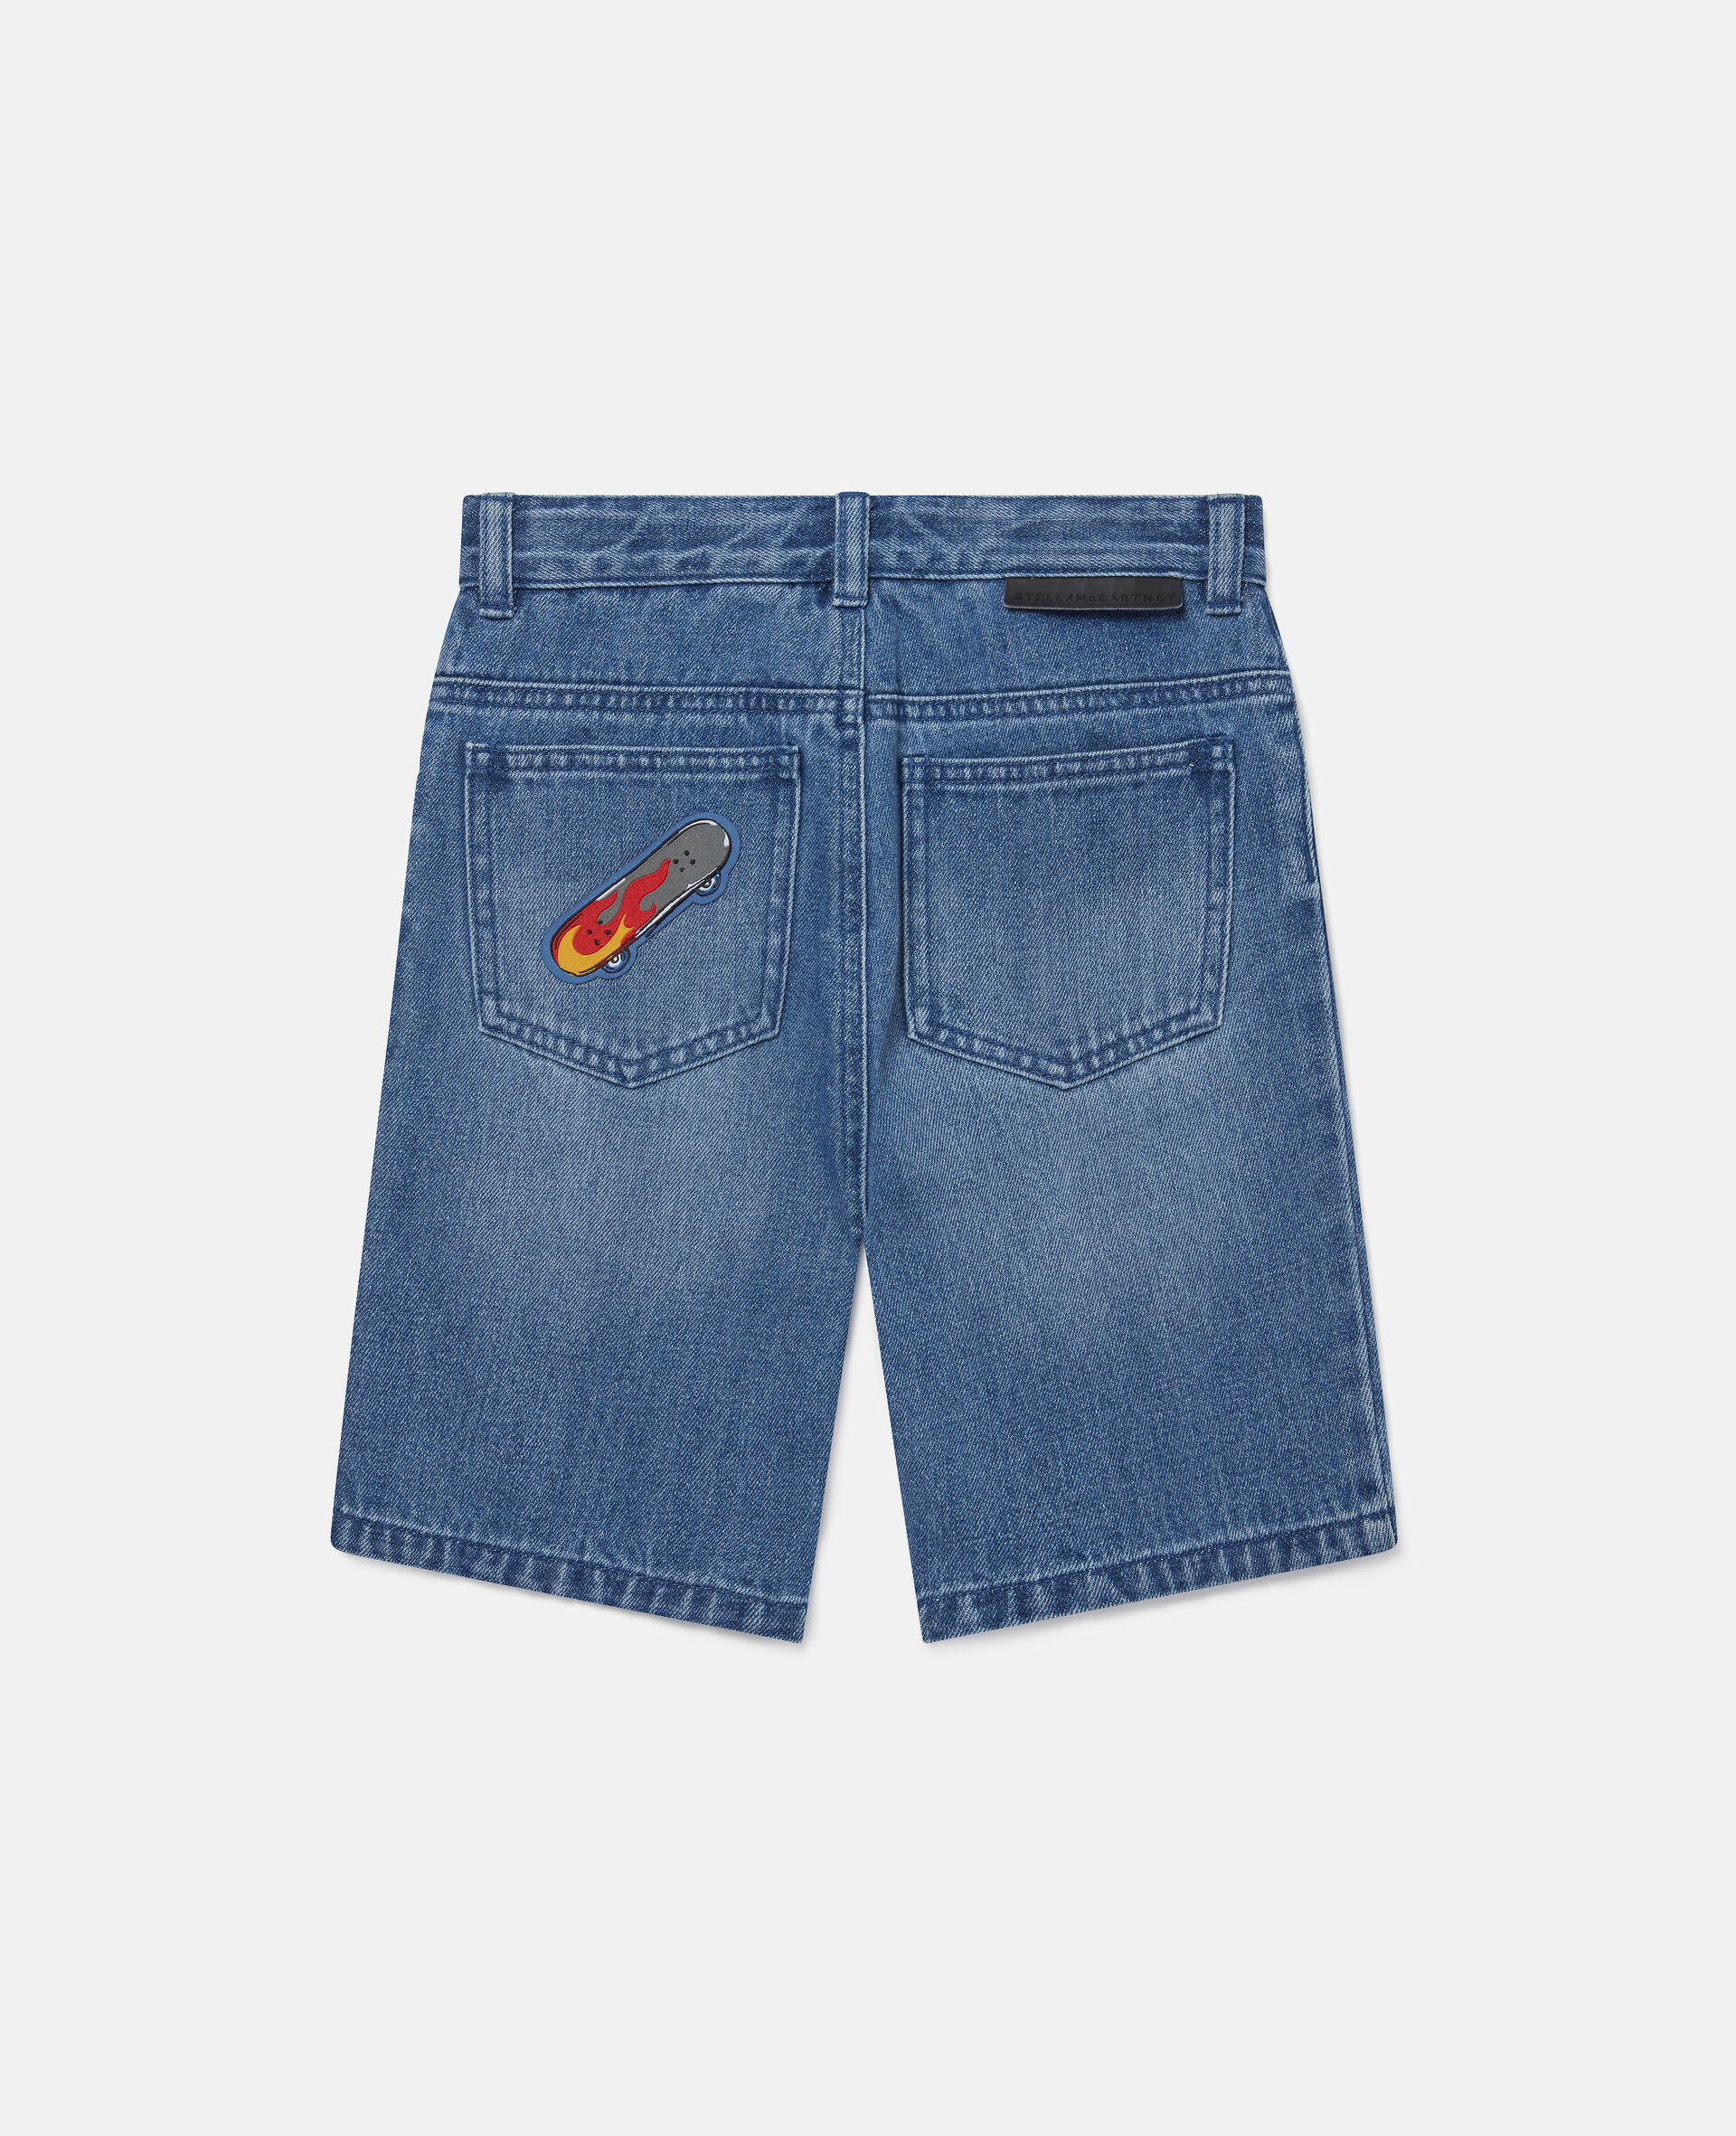 滑板徽章牛仔短裤-蓝色-large image number 3